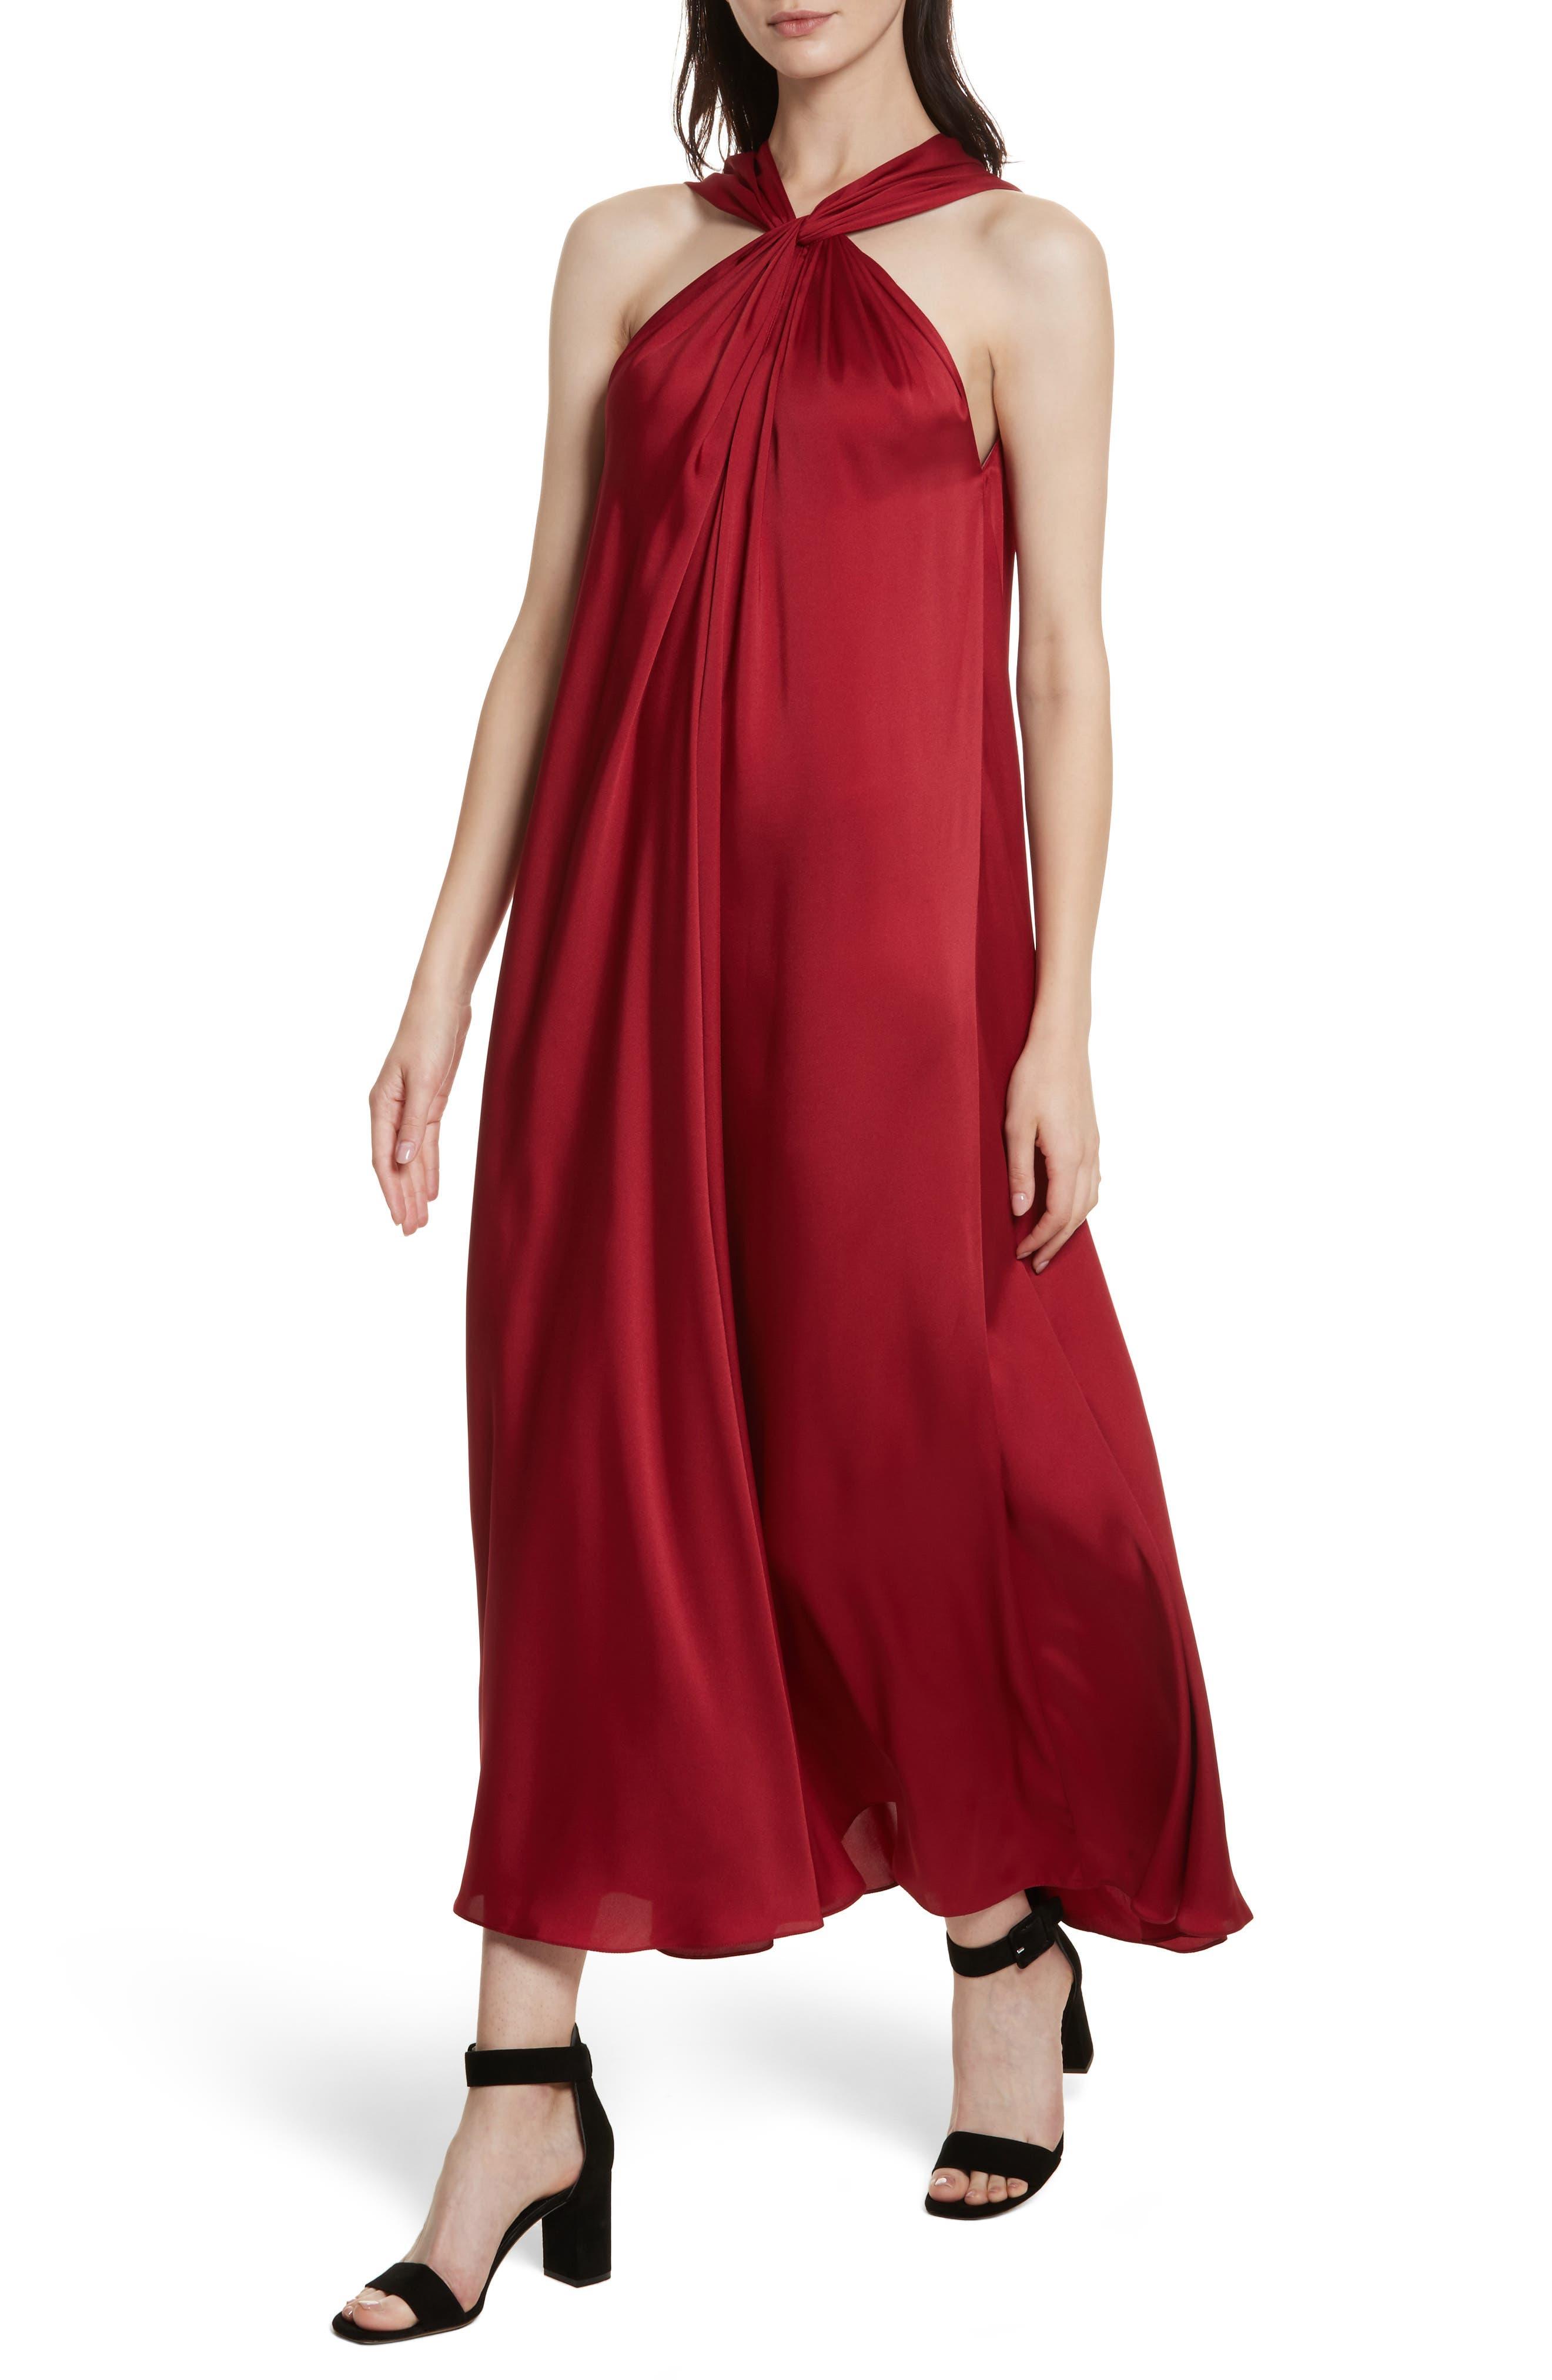 Cavan Twist Neck Satin Dress,                             Alternate thumbnail 4, color,                             Ruby